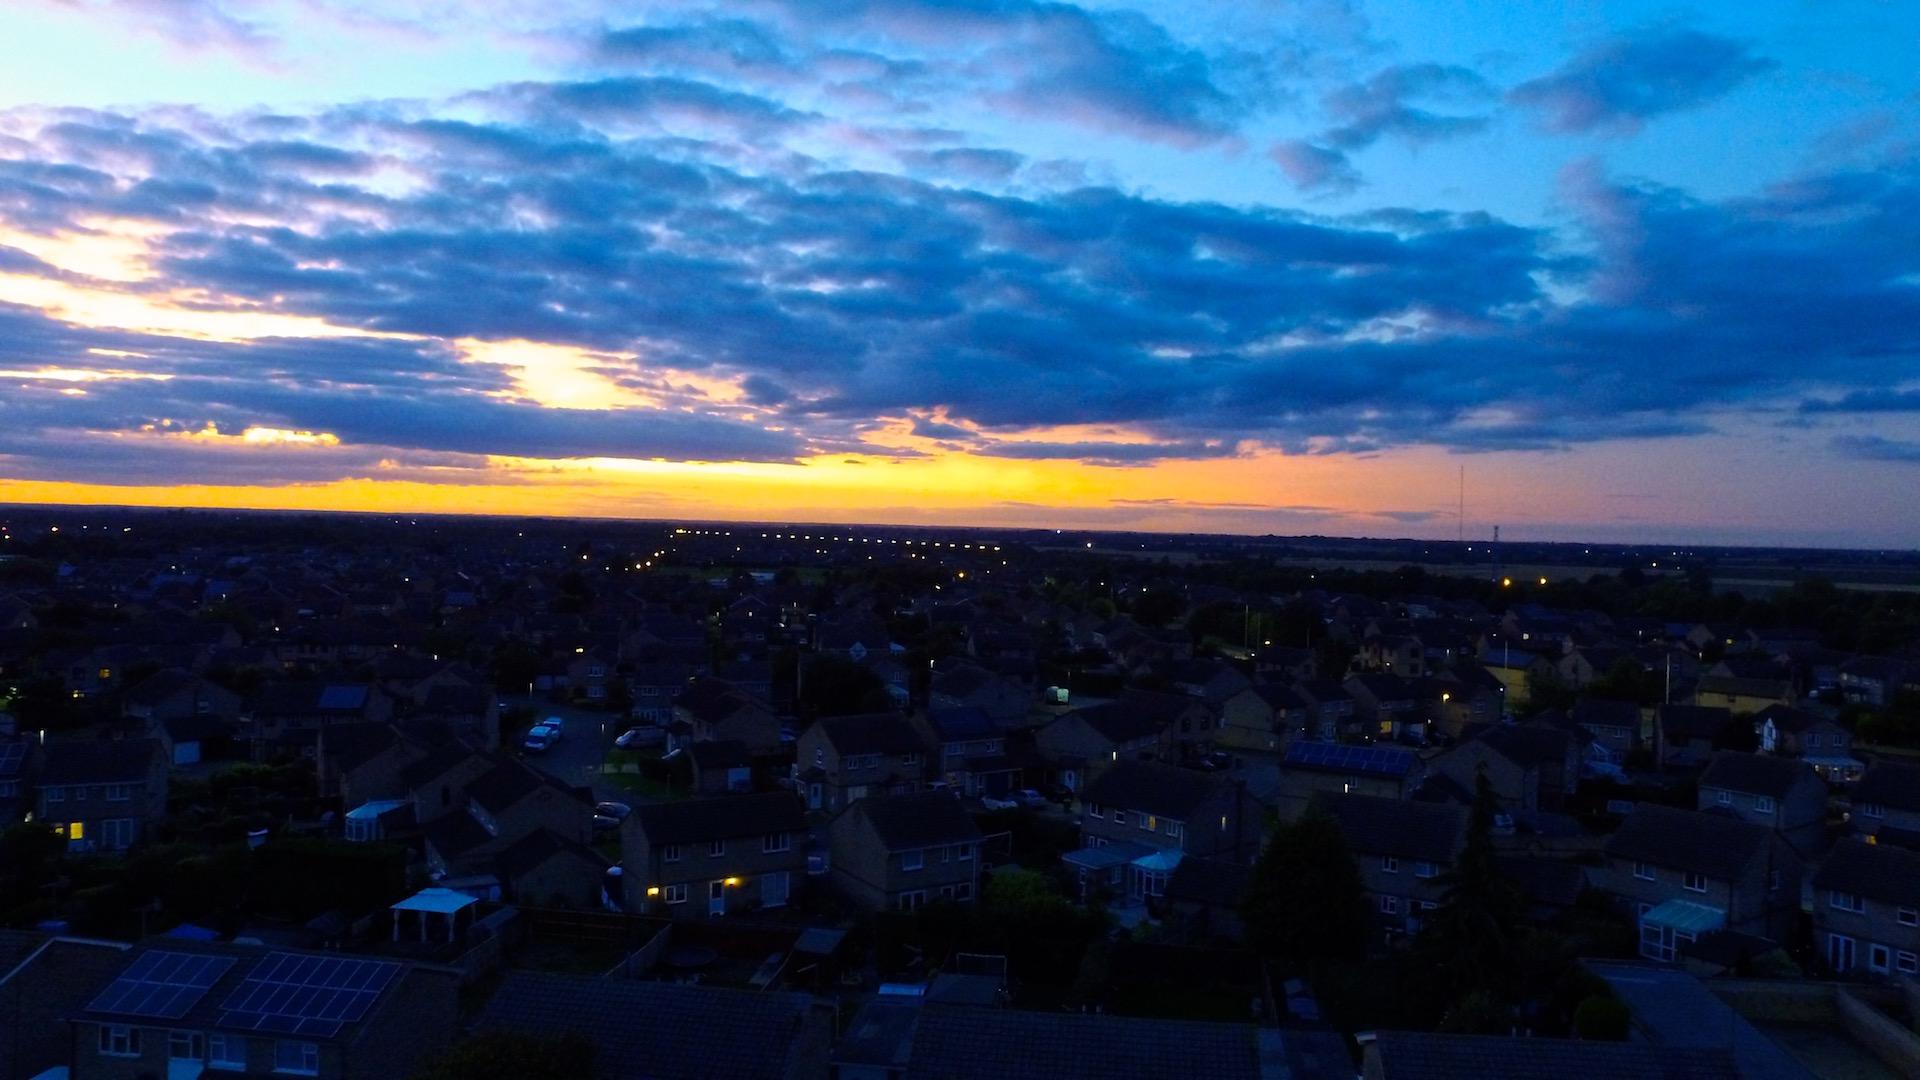 sunset over peterborough